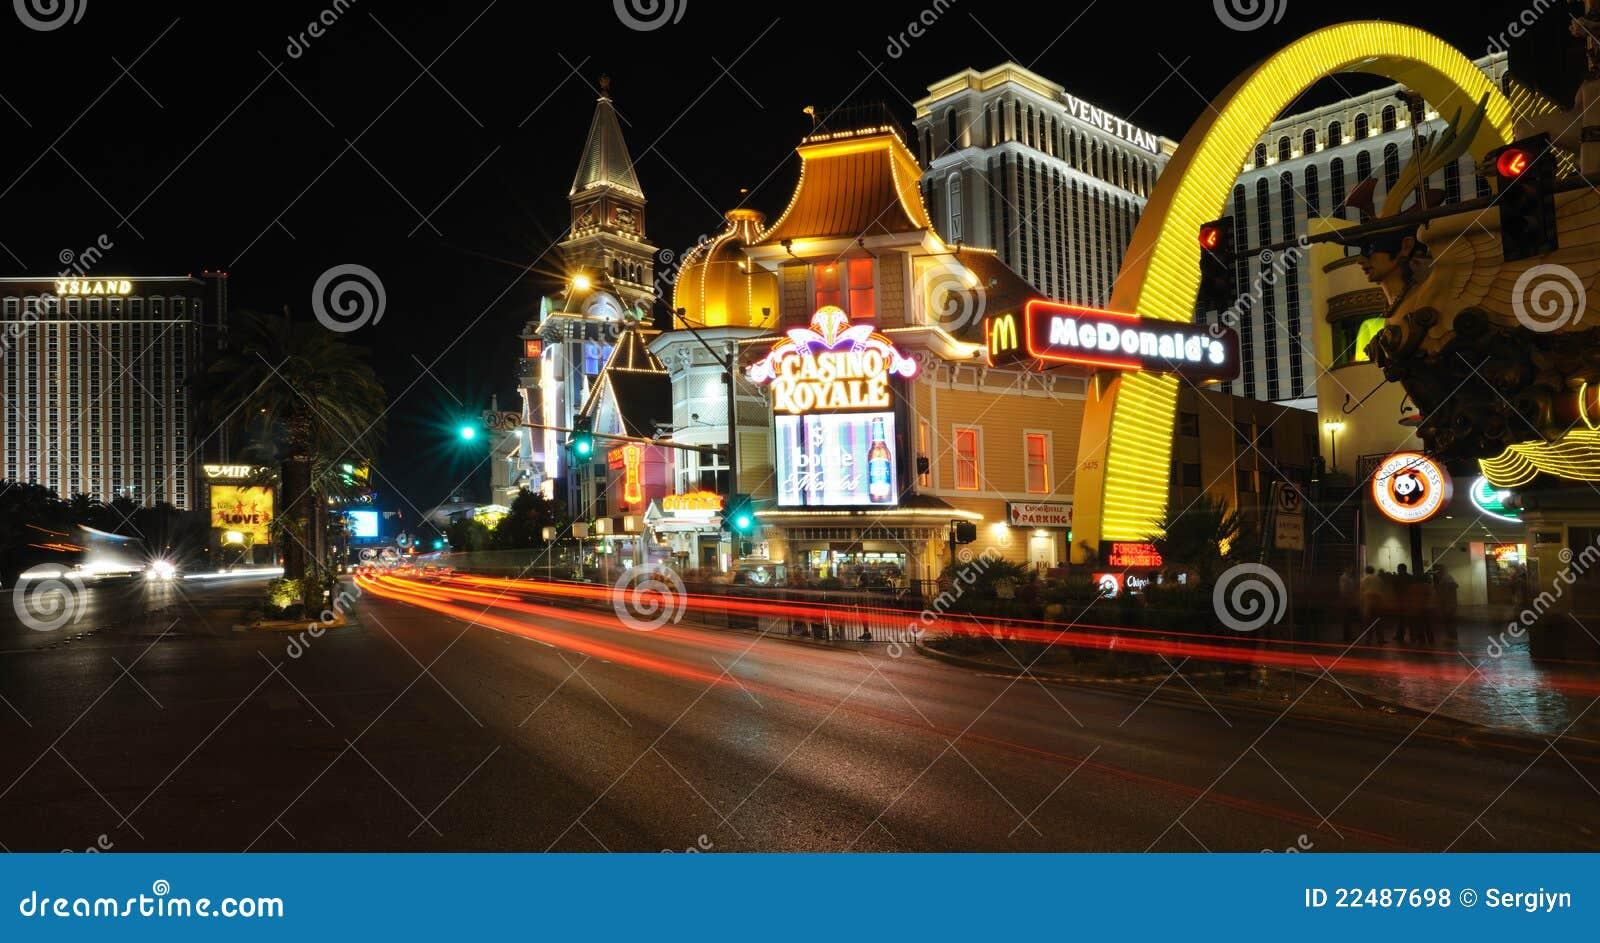 royal vegas online casino download online casino neu